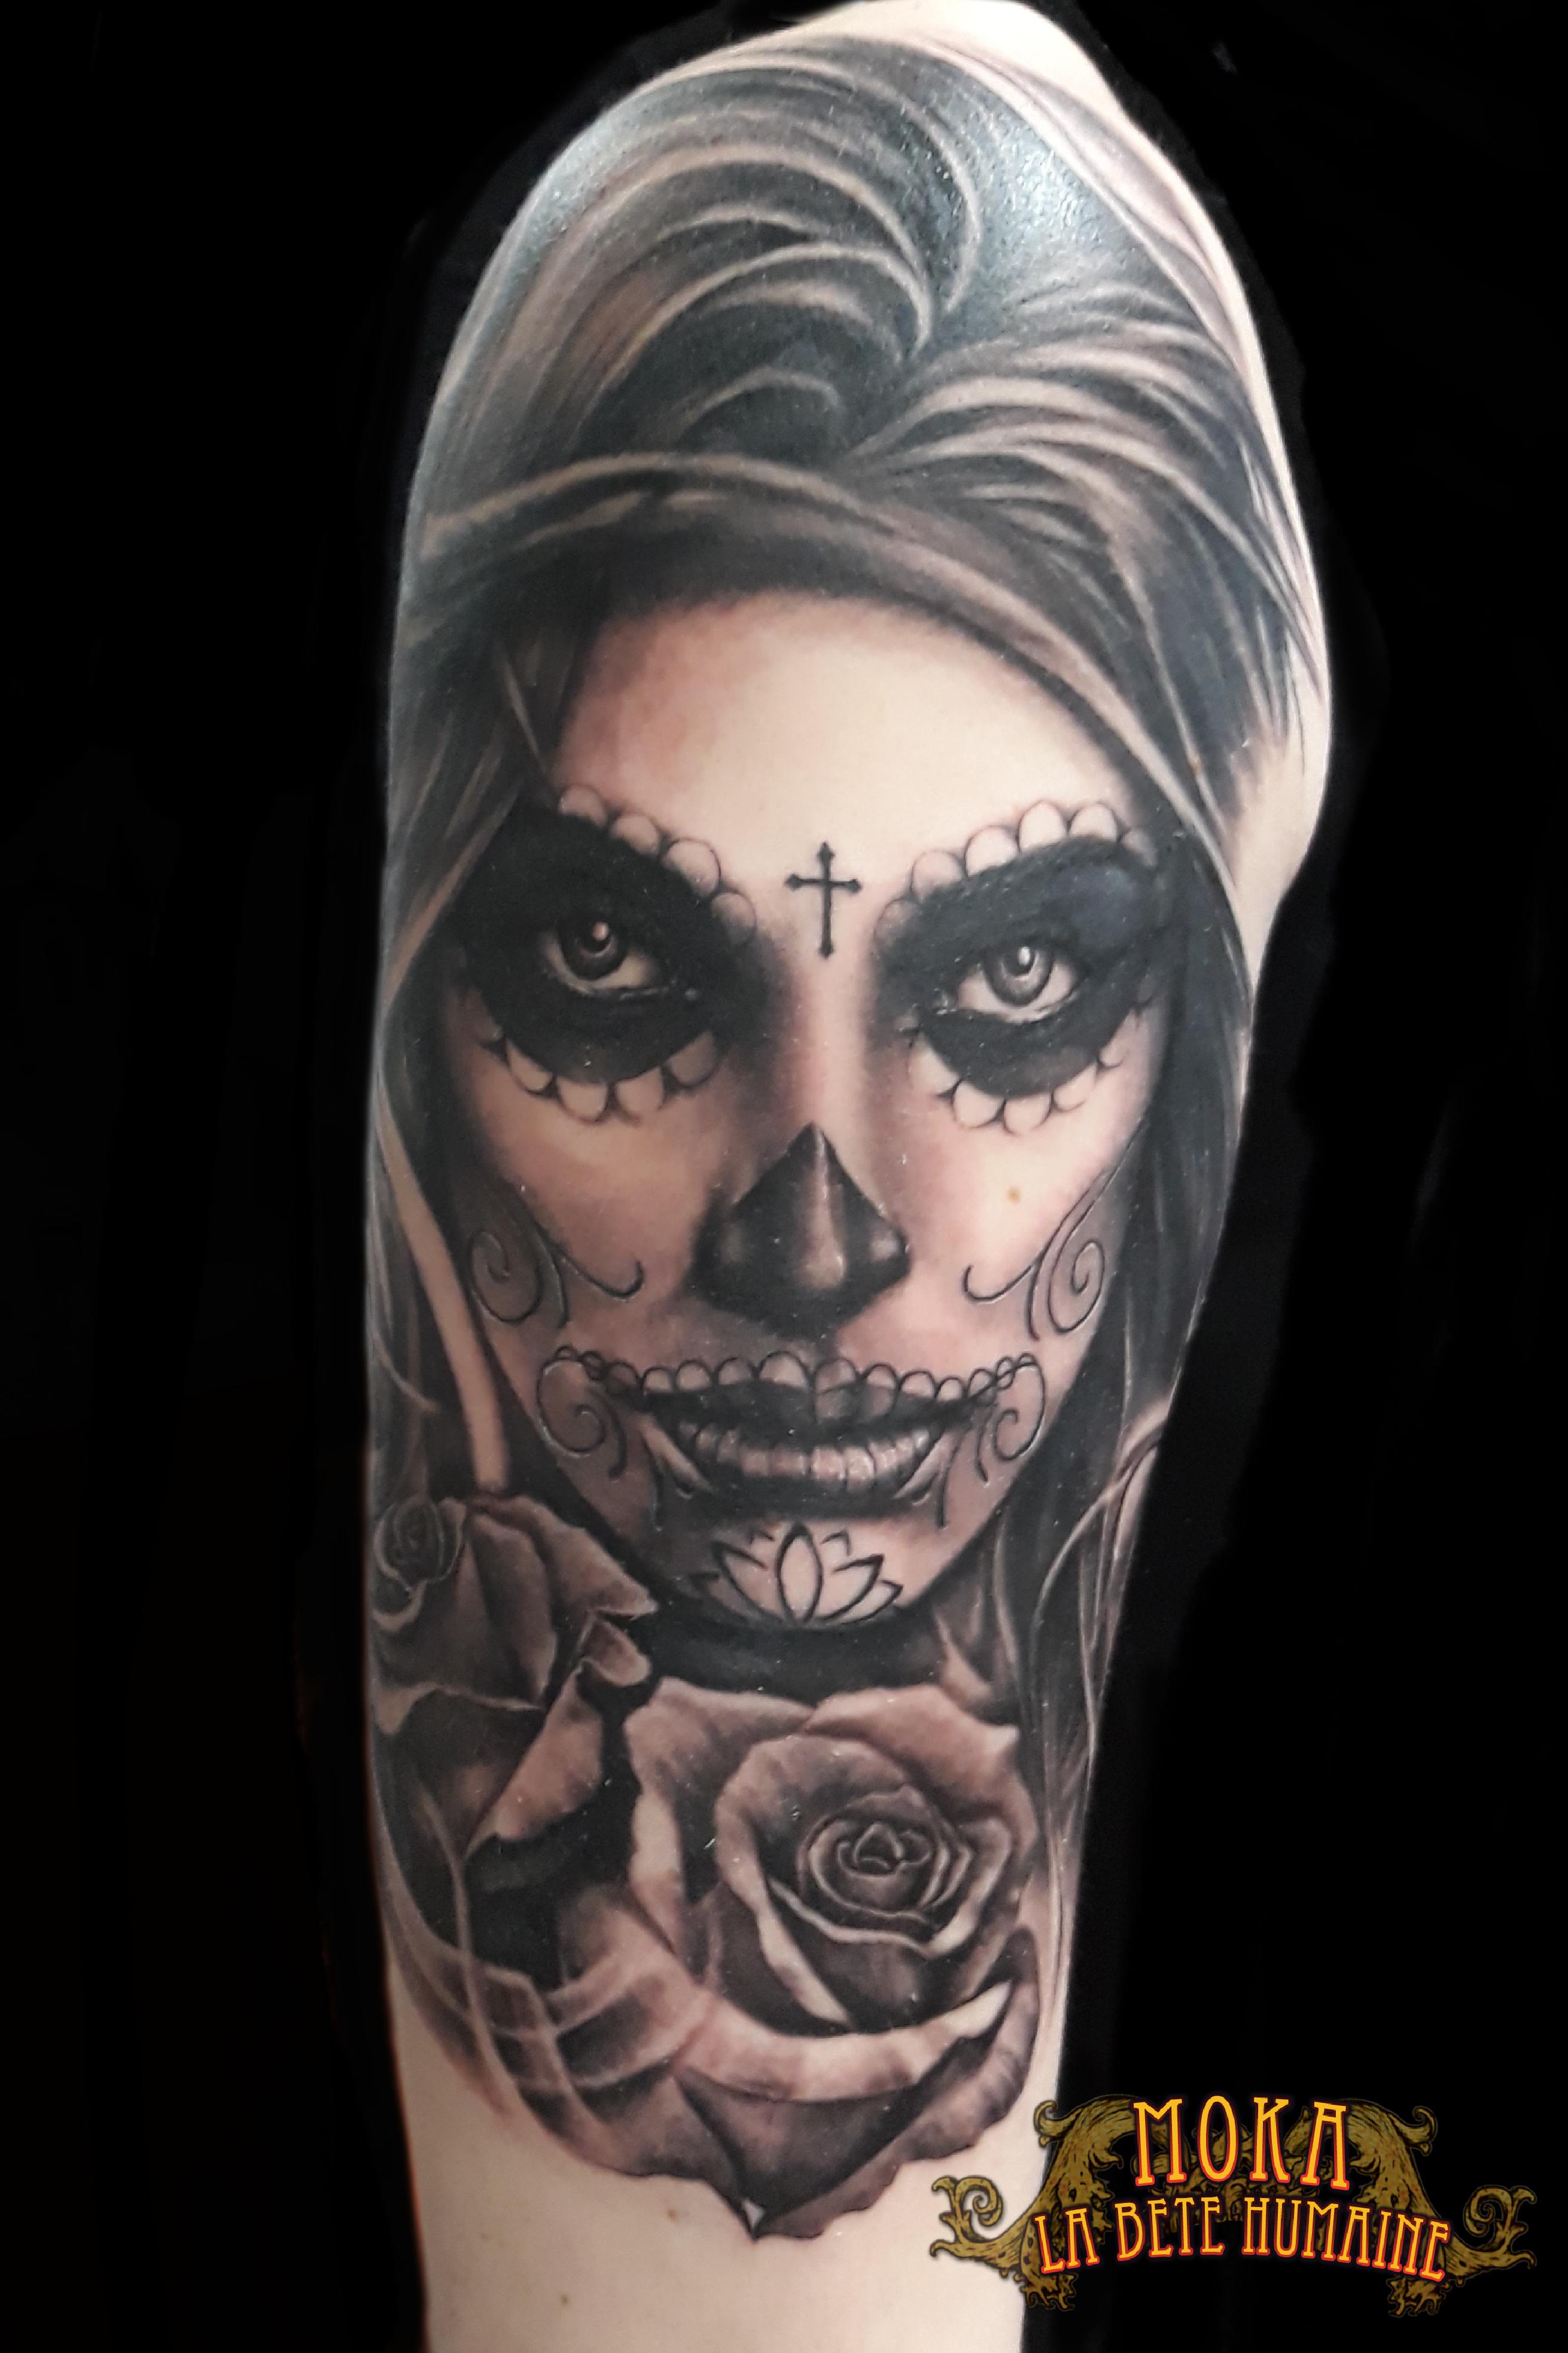 Galerie Tattoo 10 Catrina Nees Dans Notre Studio La Bete Humaine Tatouage